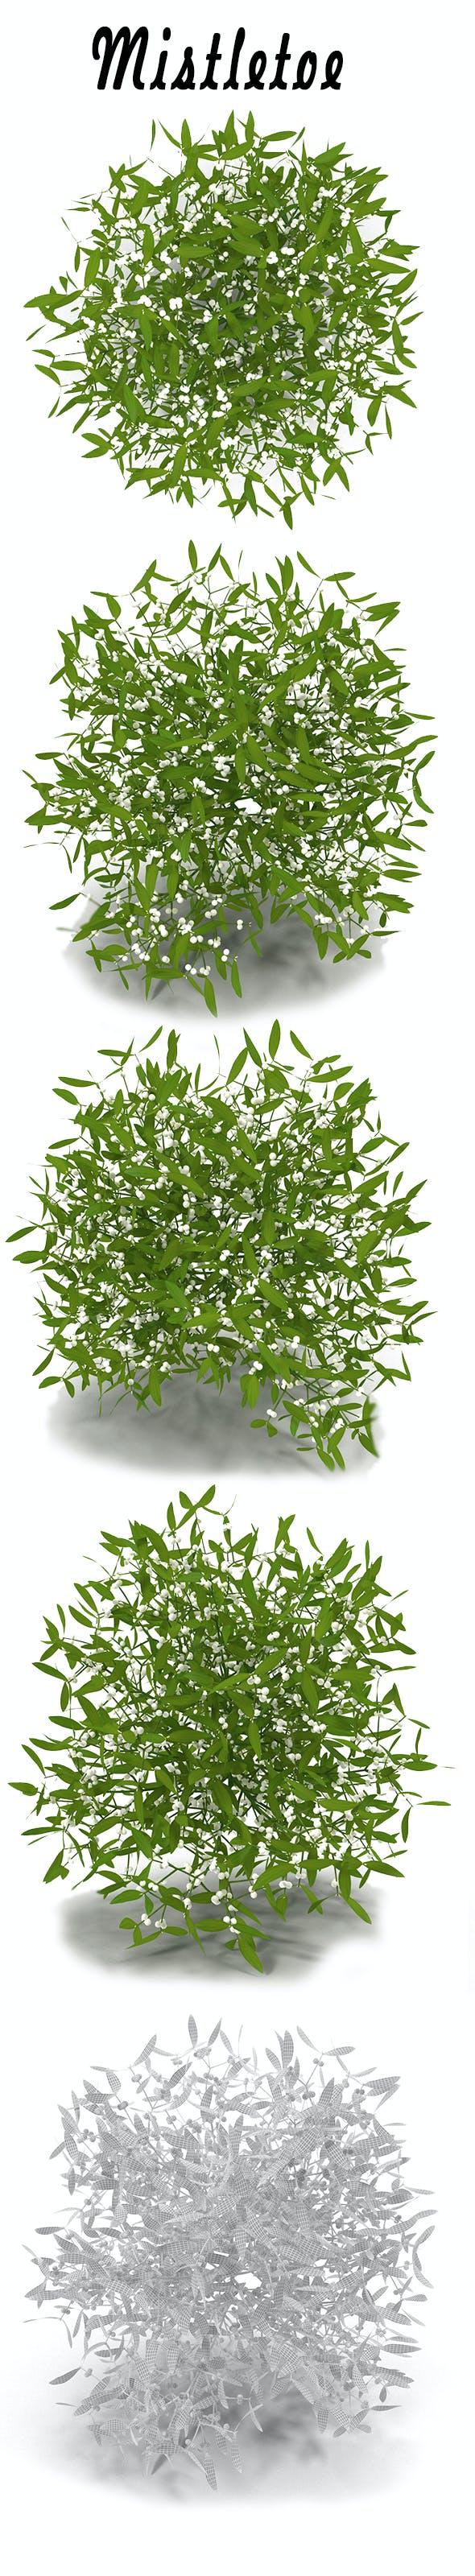 Mistletoe - 3DOcean Item for Sale